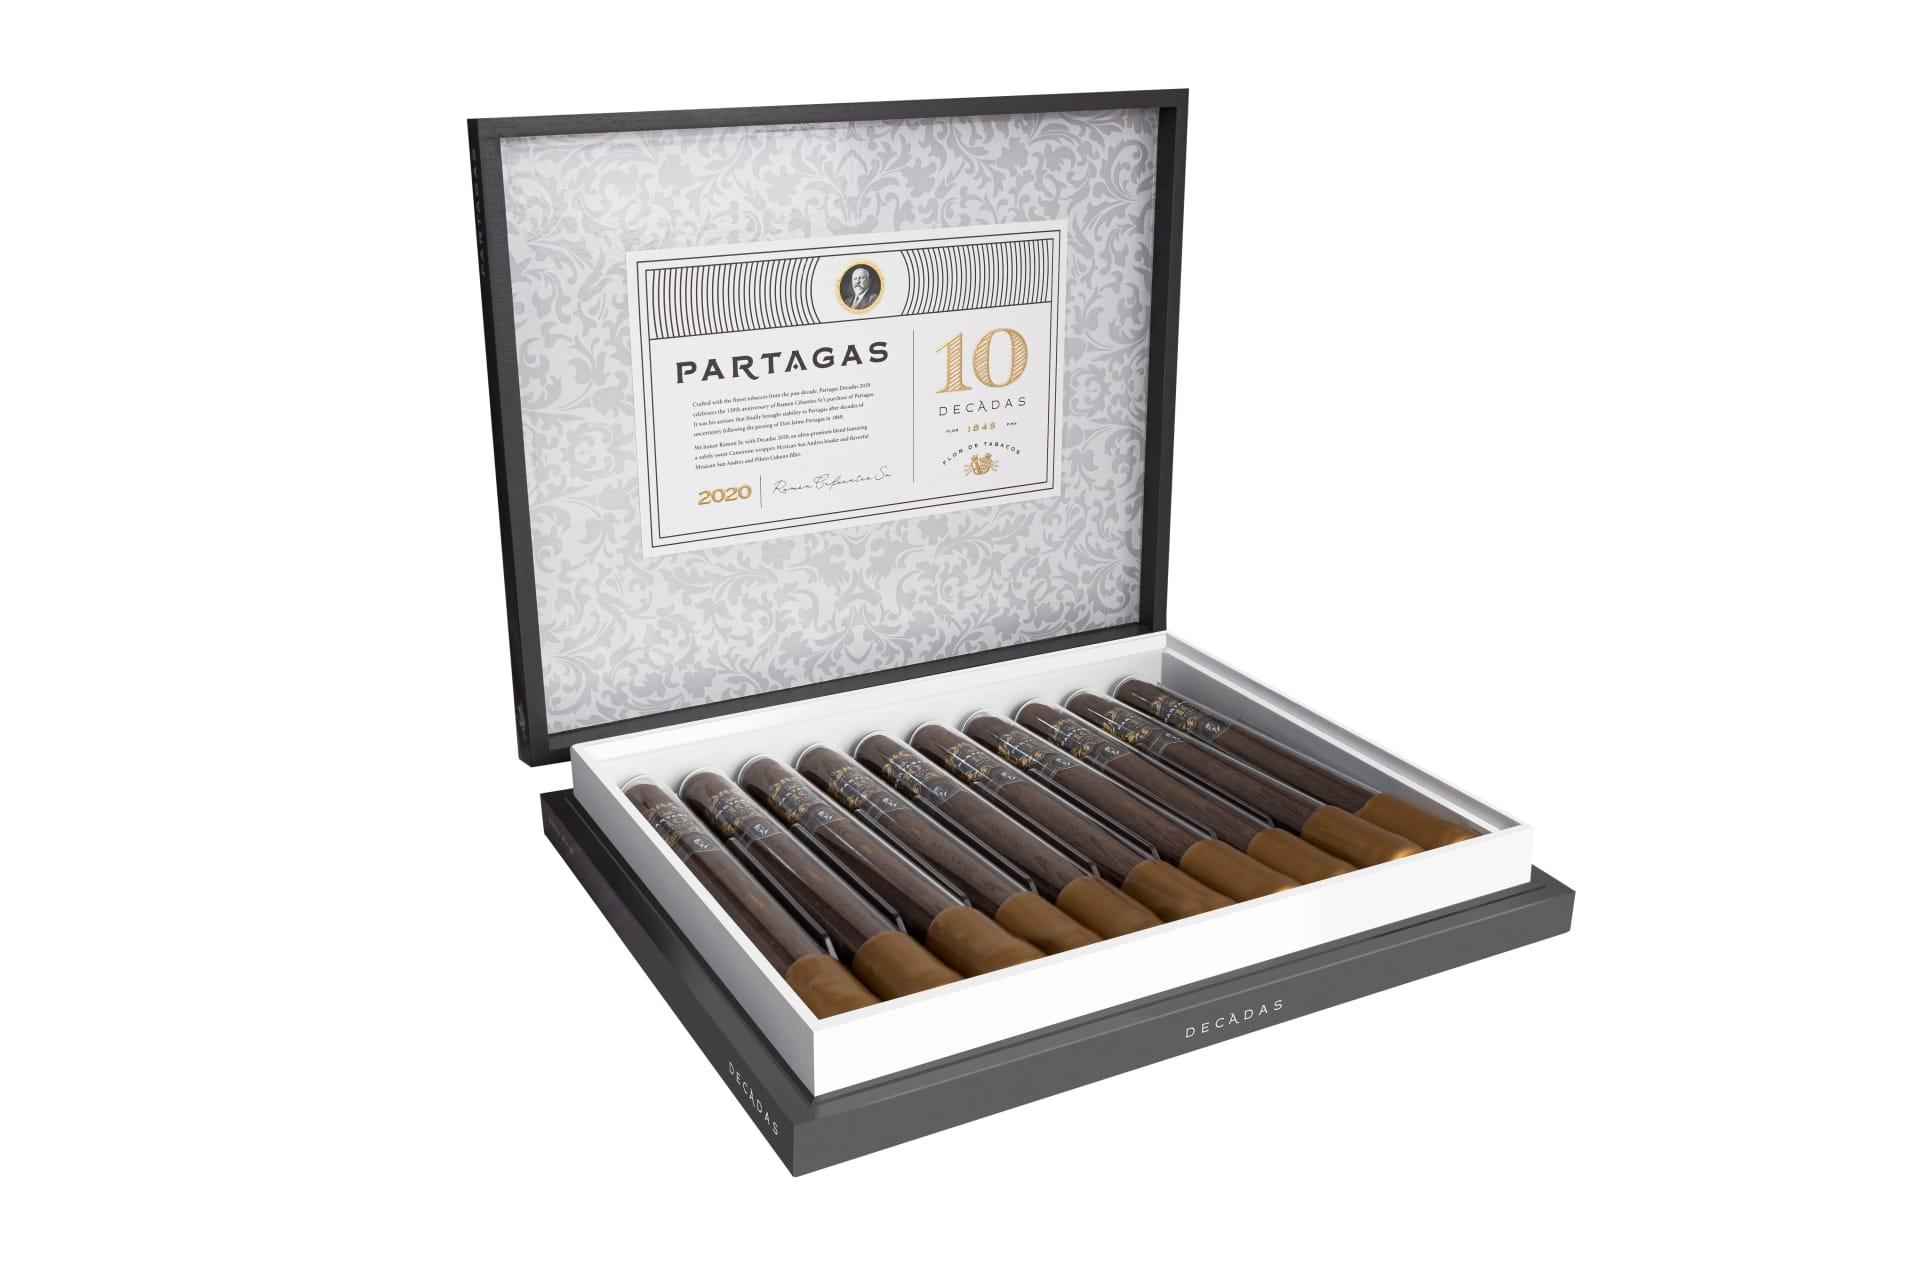 Cigar News: General Cigar Announces Partagas Limited Reserve Decadas 2020 Featured Image